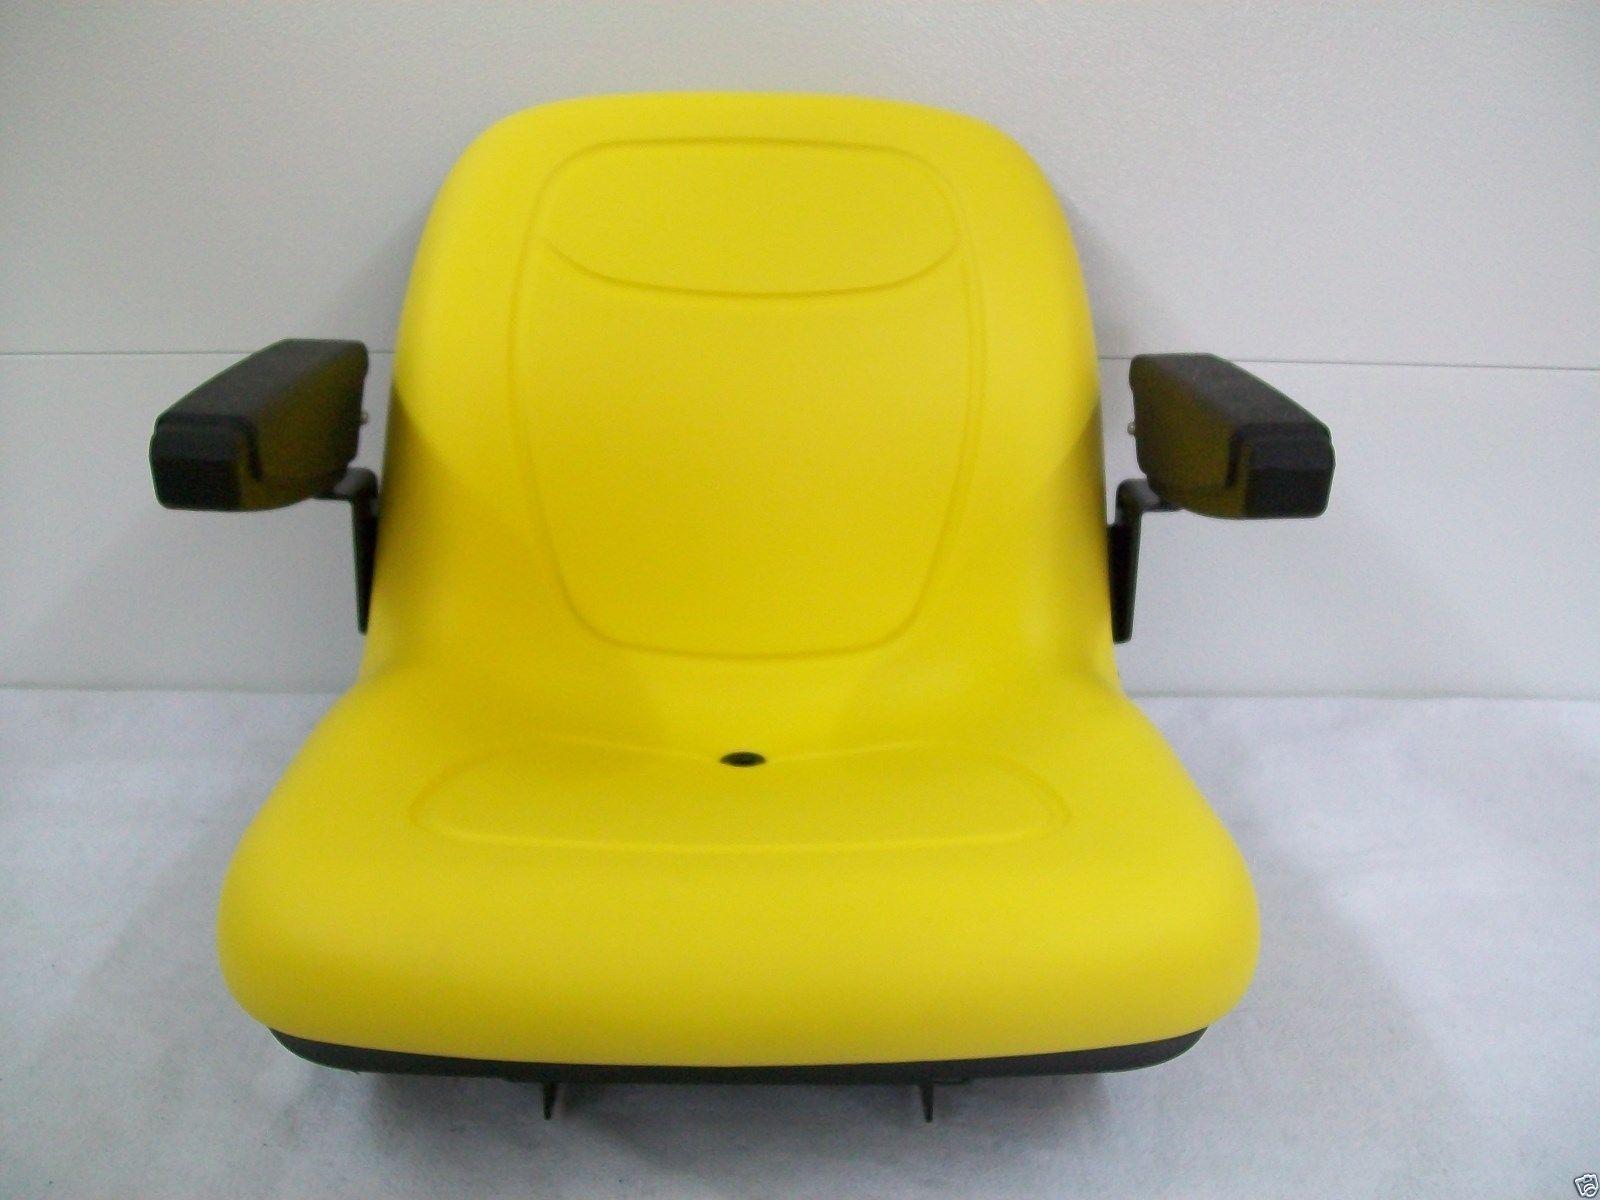 John Deere 950 Tractor Seat : High back yellow seat fits  john